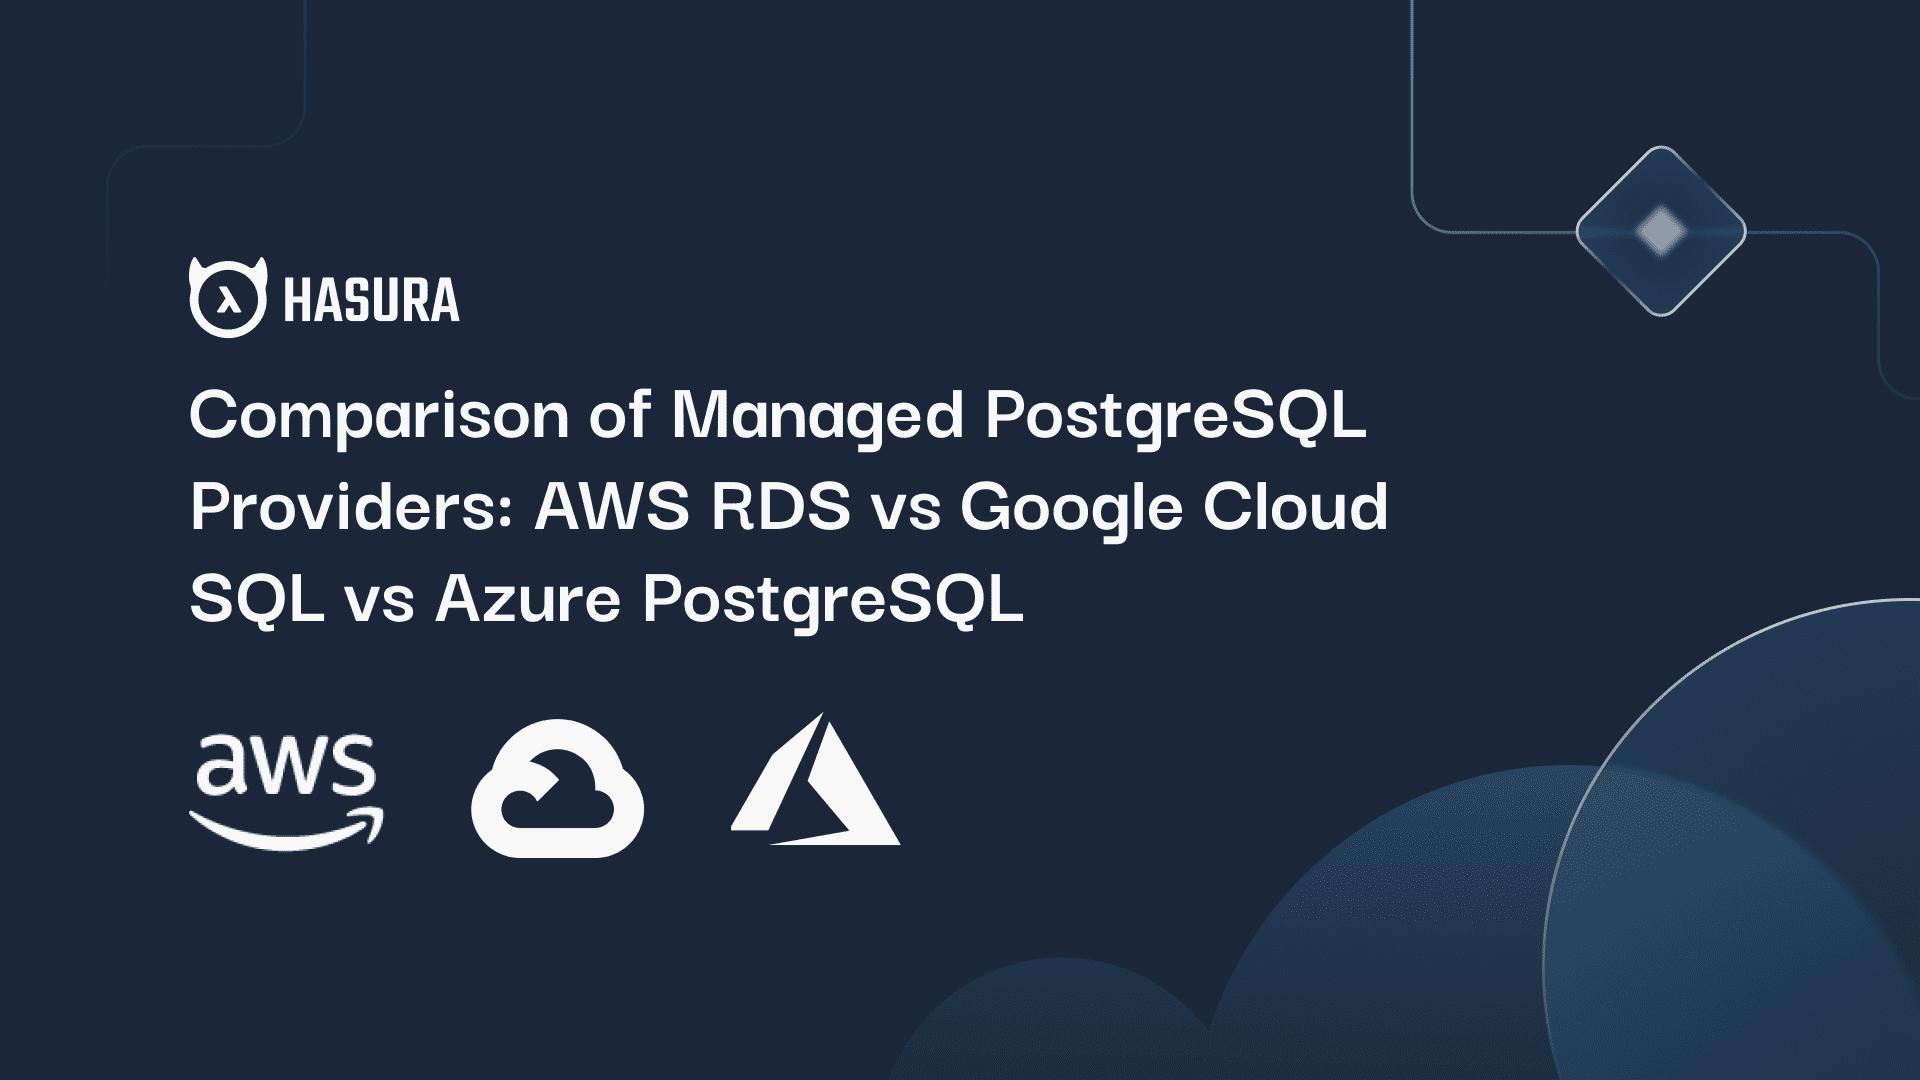 Comparison of Managed PostgreSQL Providers